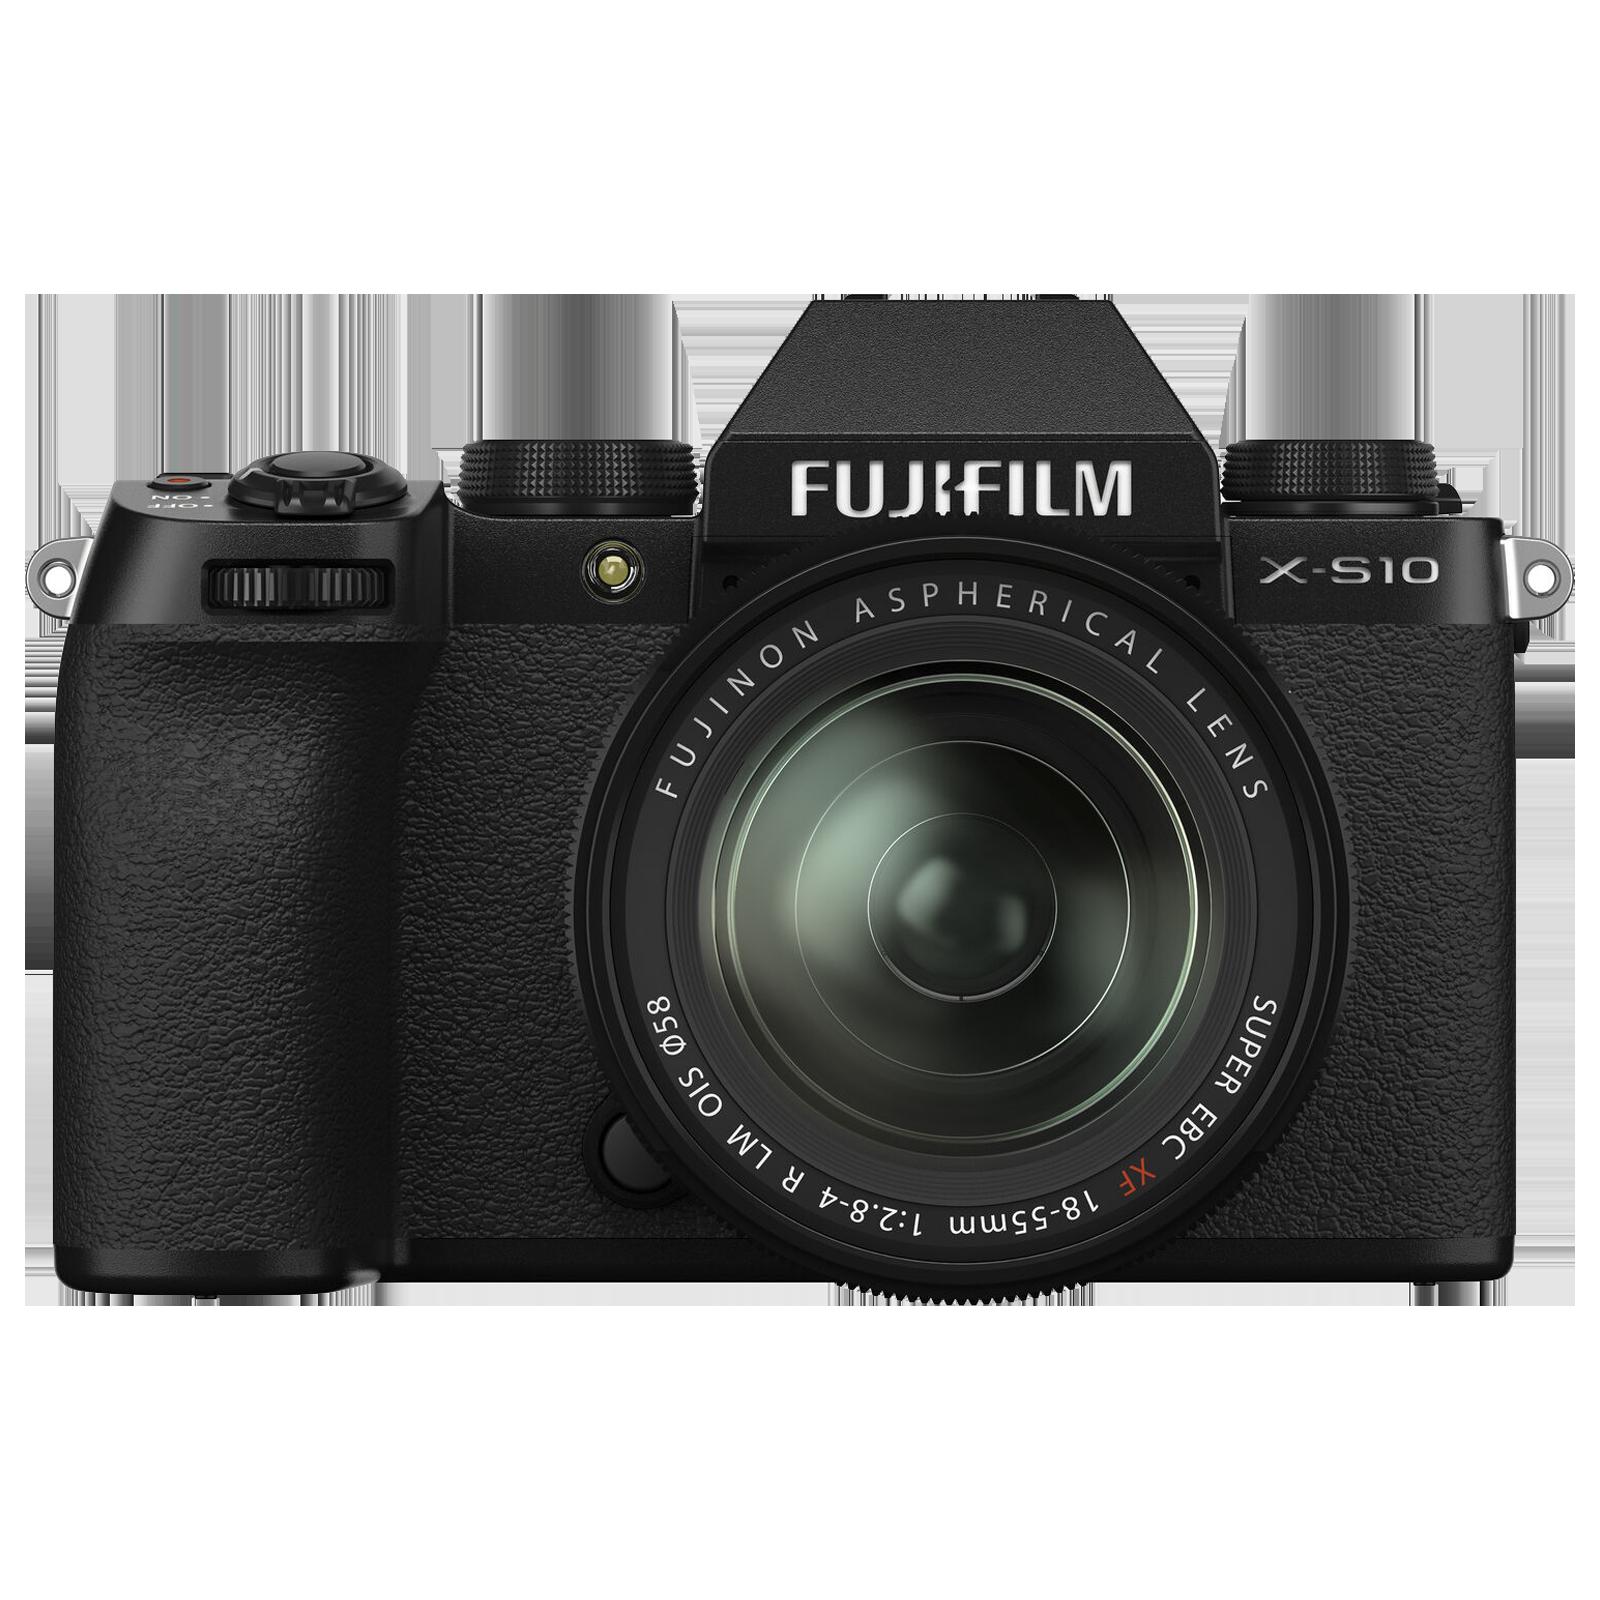 Fujifilm X Series 26.1MP Mirrorless Camera (XF 18 - 55mm Lens, X-Trans CMOS 4 Sensor, X-S10, Black)_1